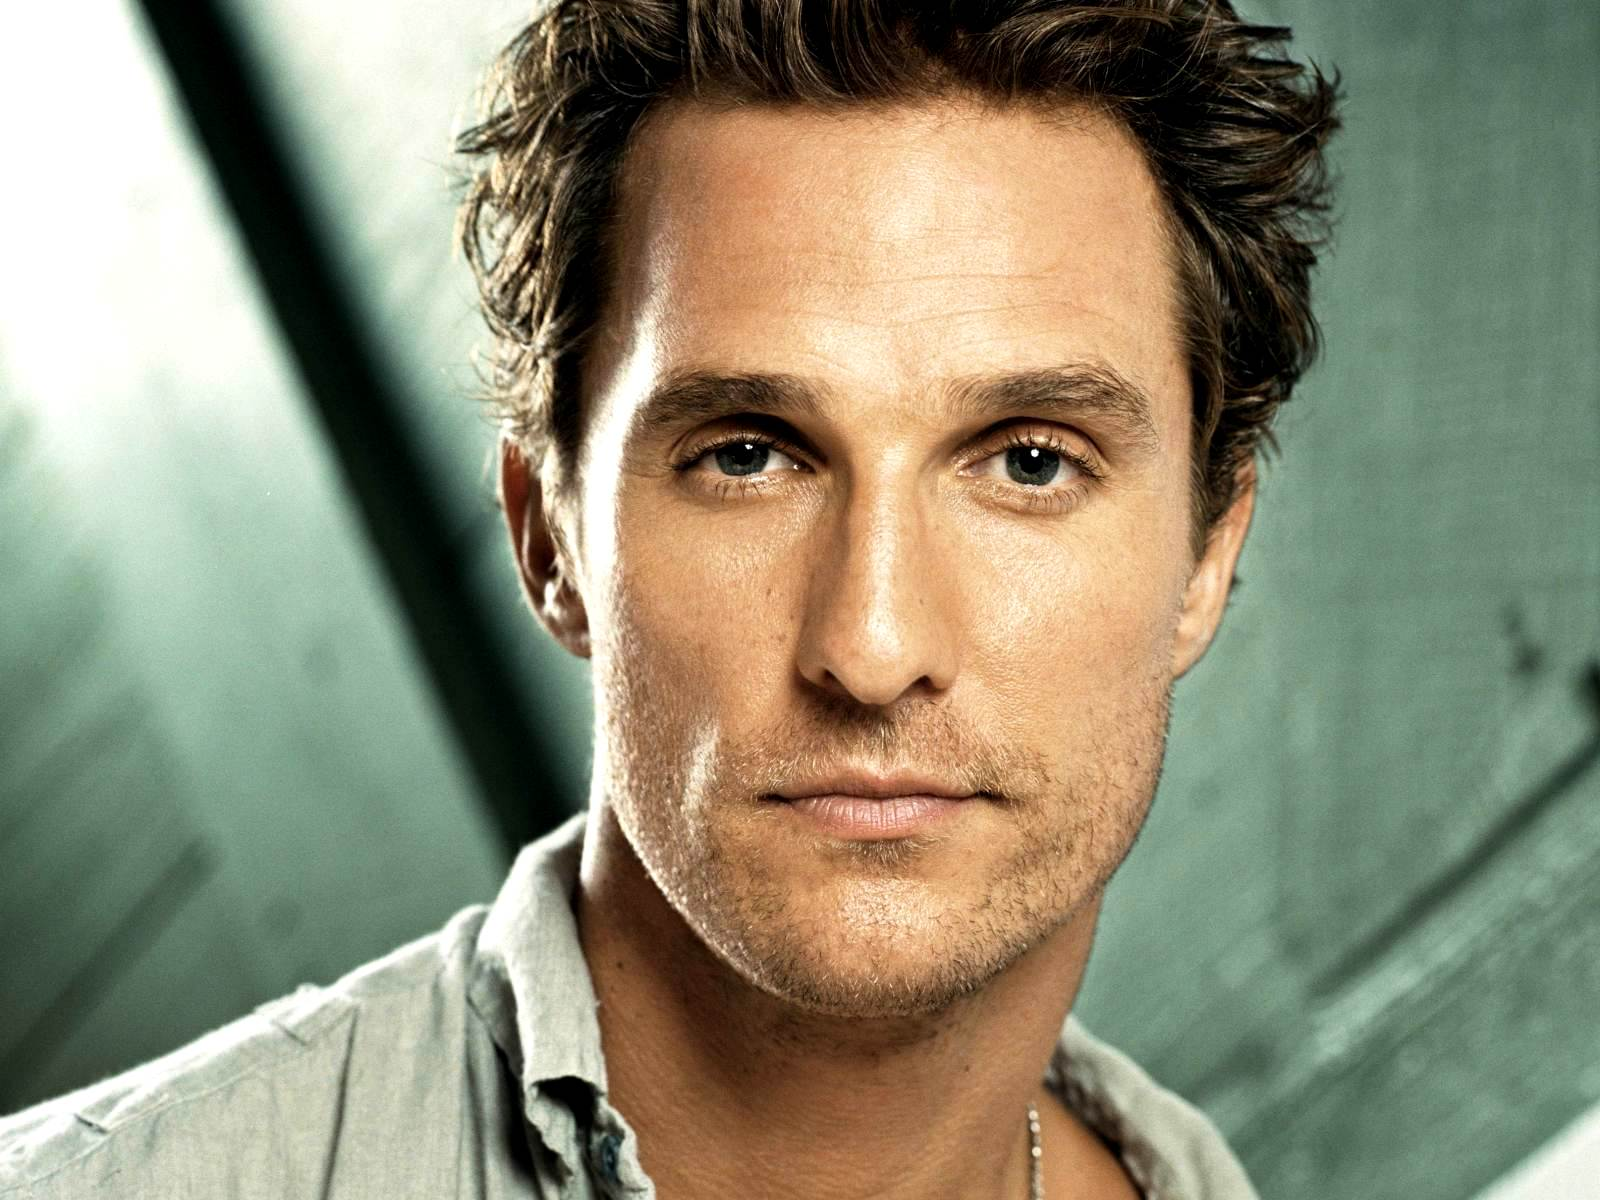 Matthew McConaughey Wallpaper